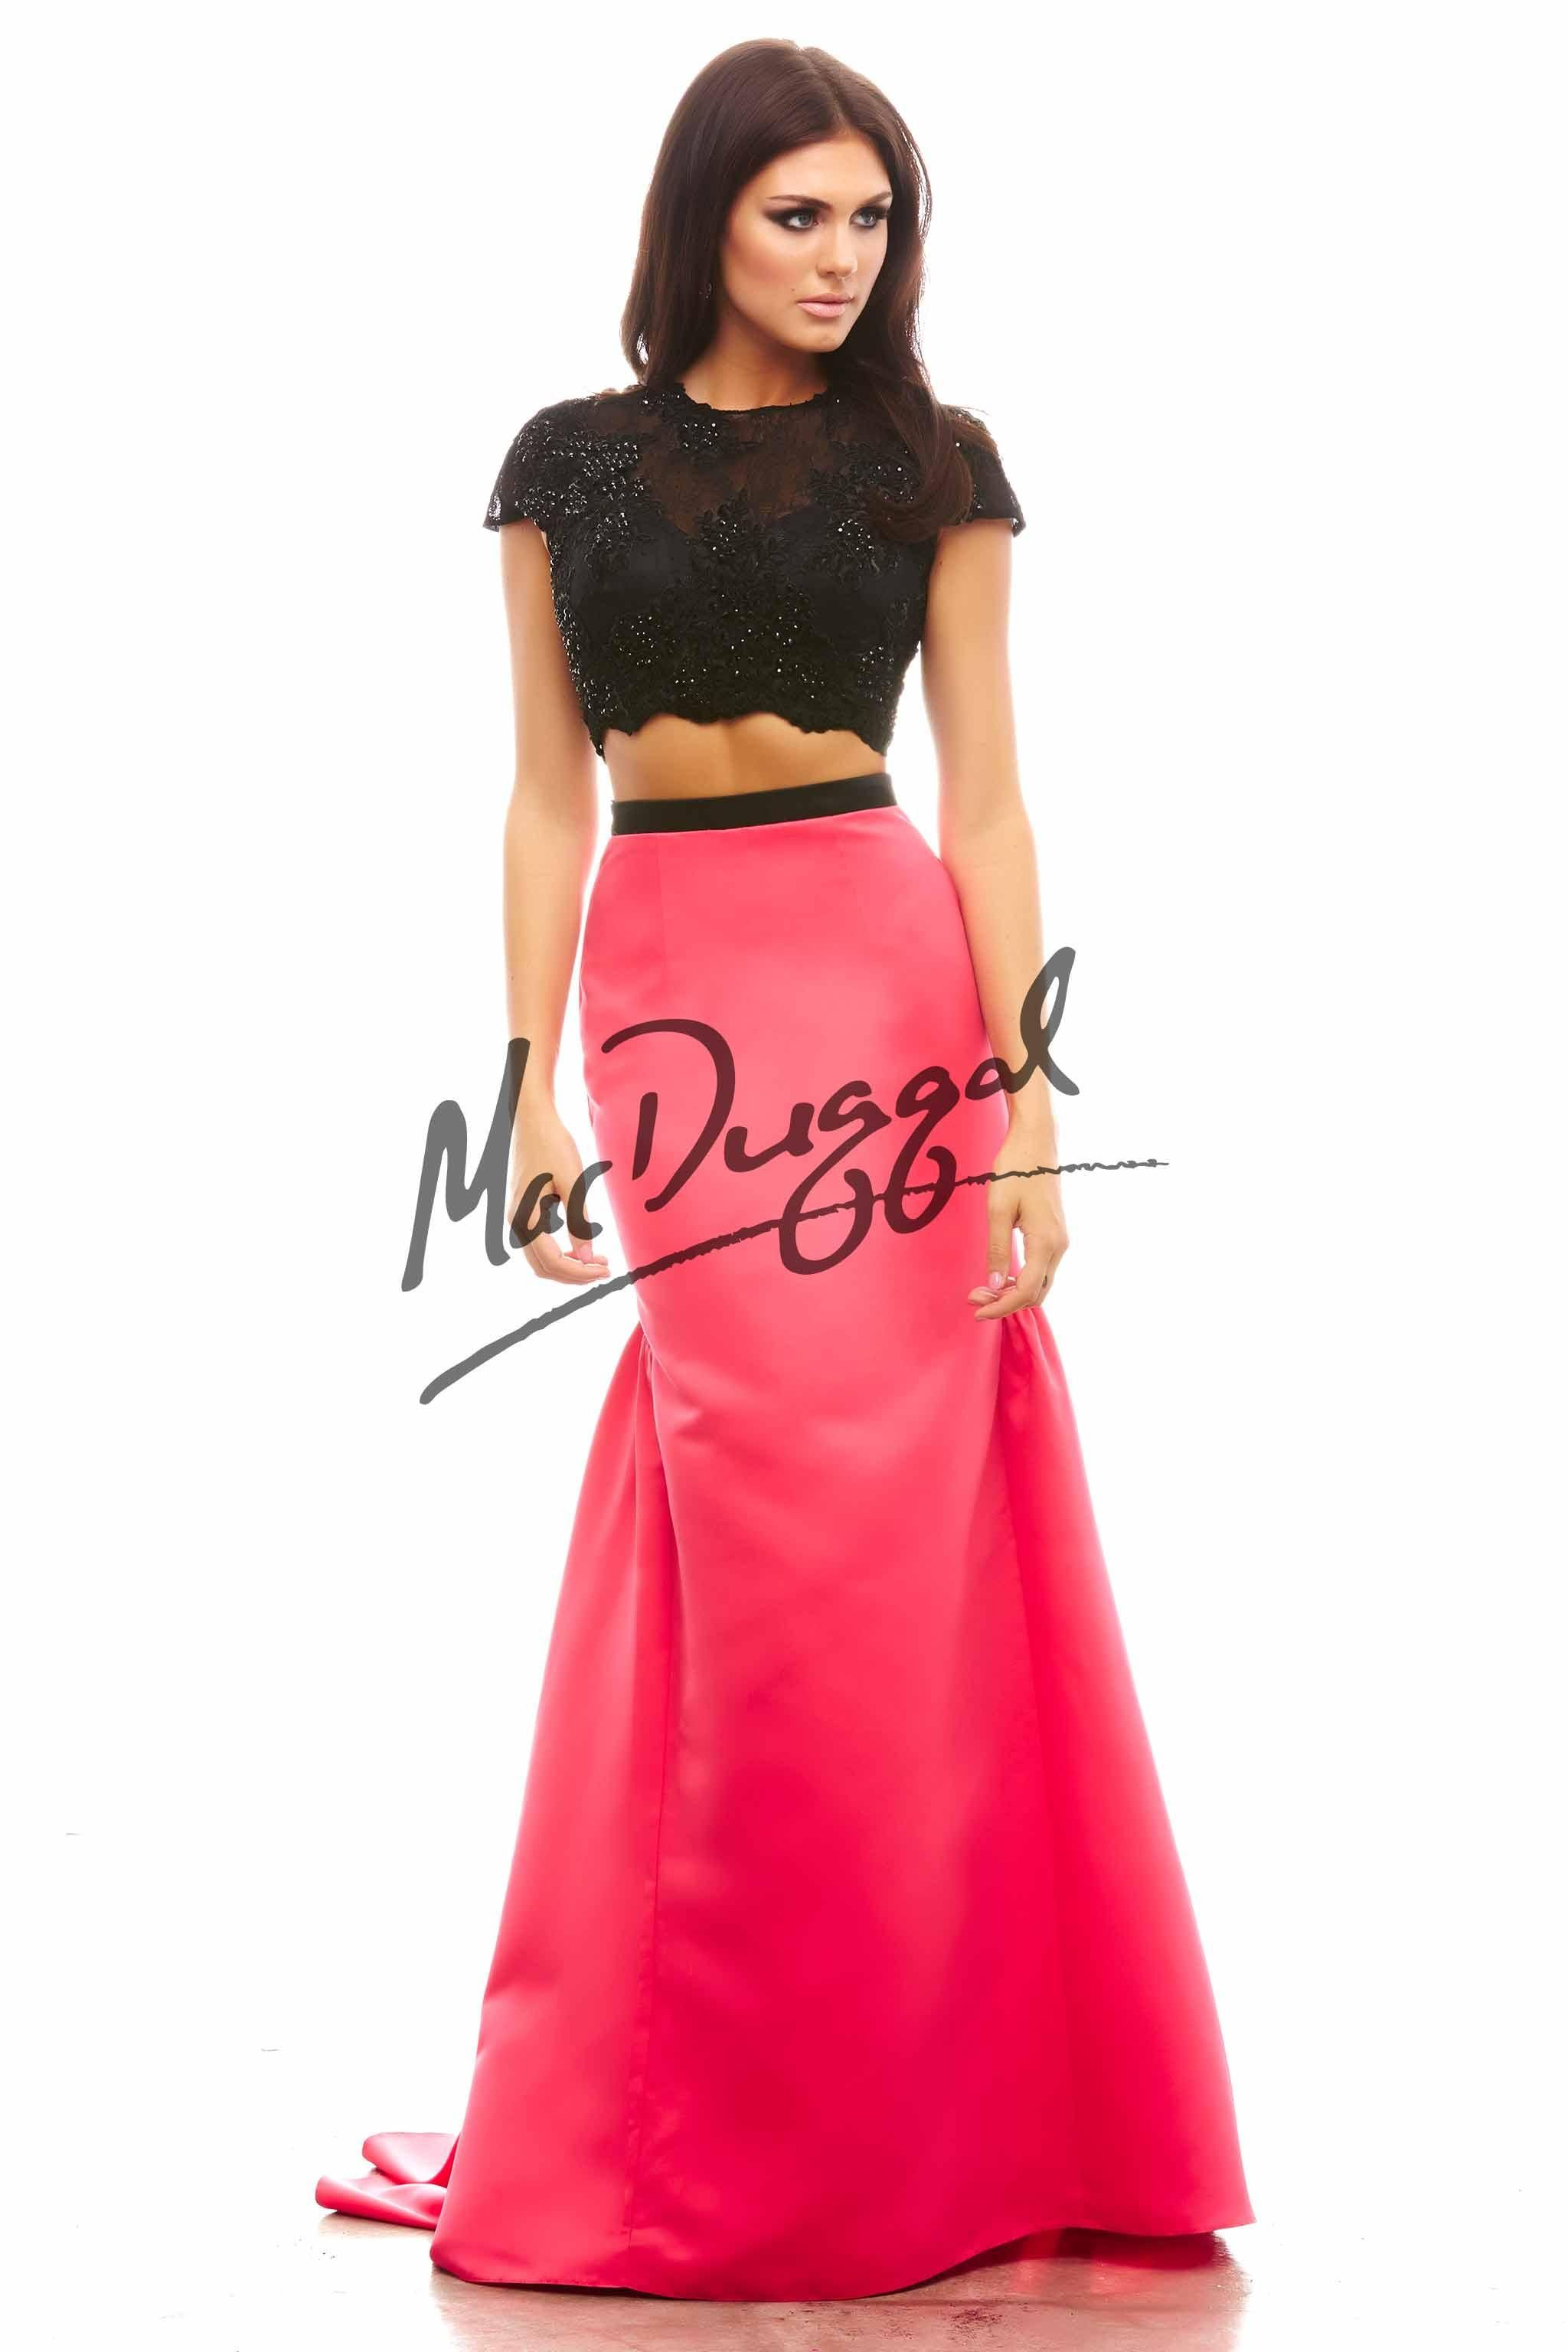 crop top prom dresses 2015 - Google Search   Prom dress ideas ...